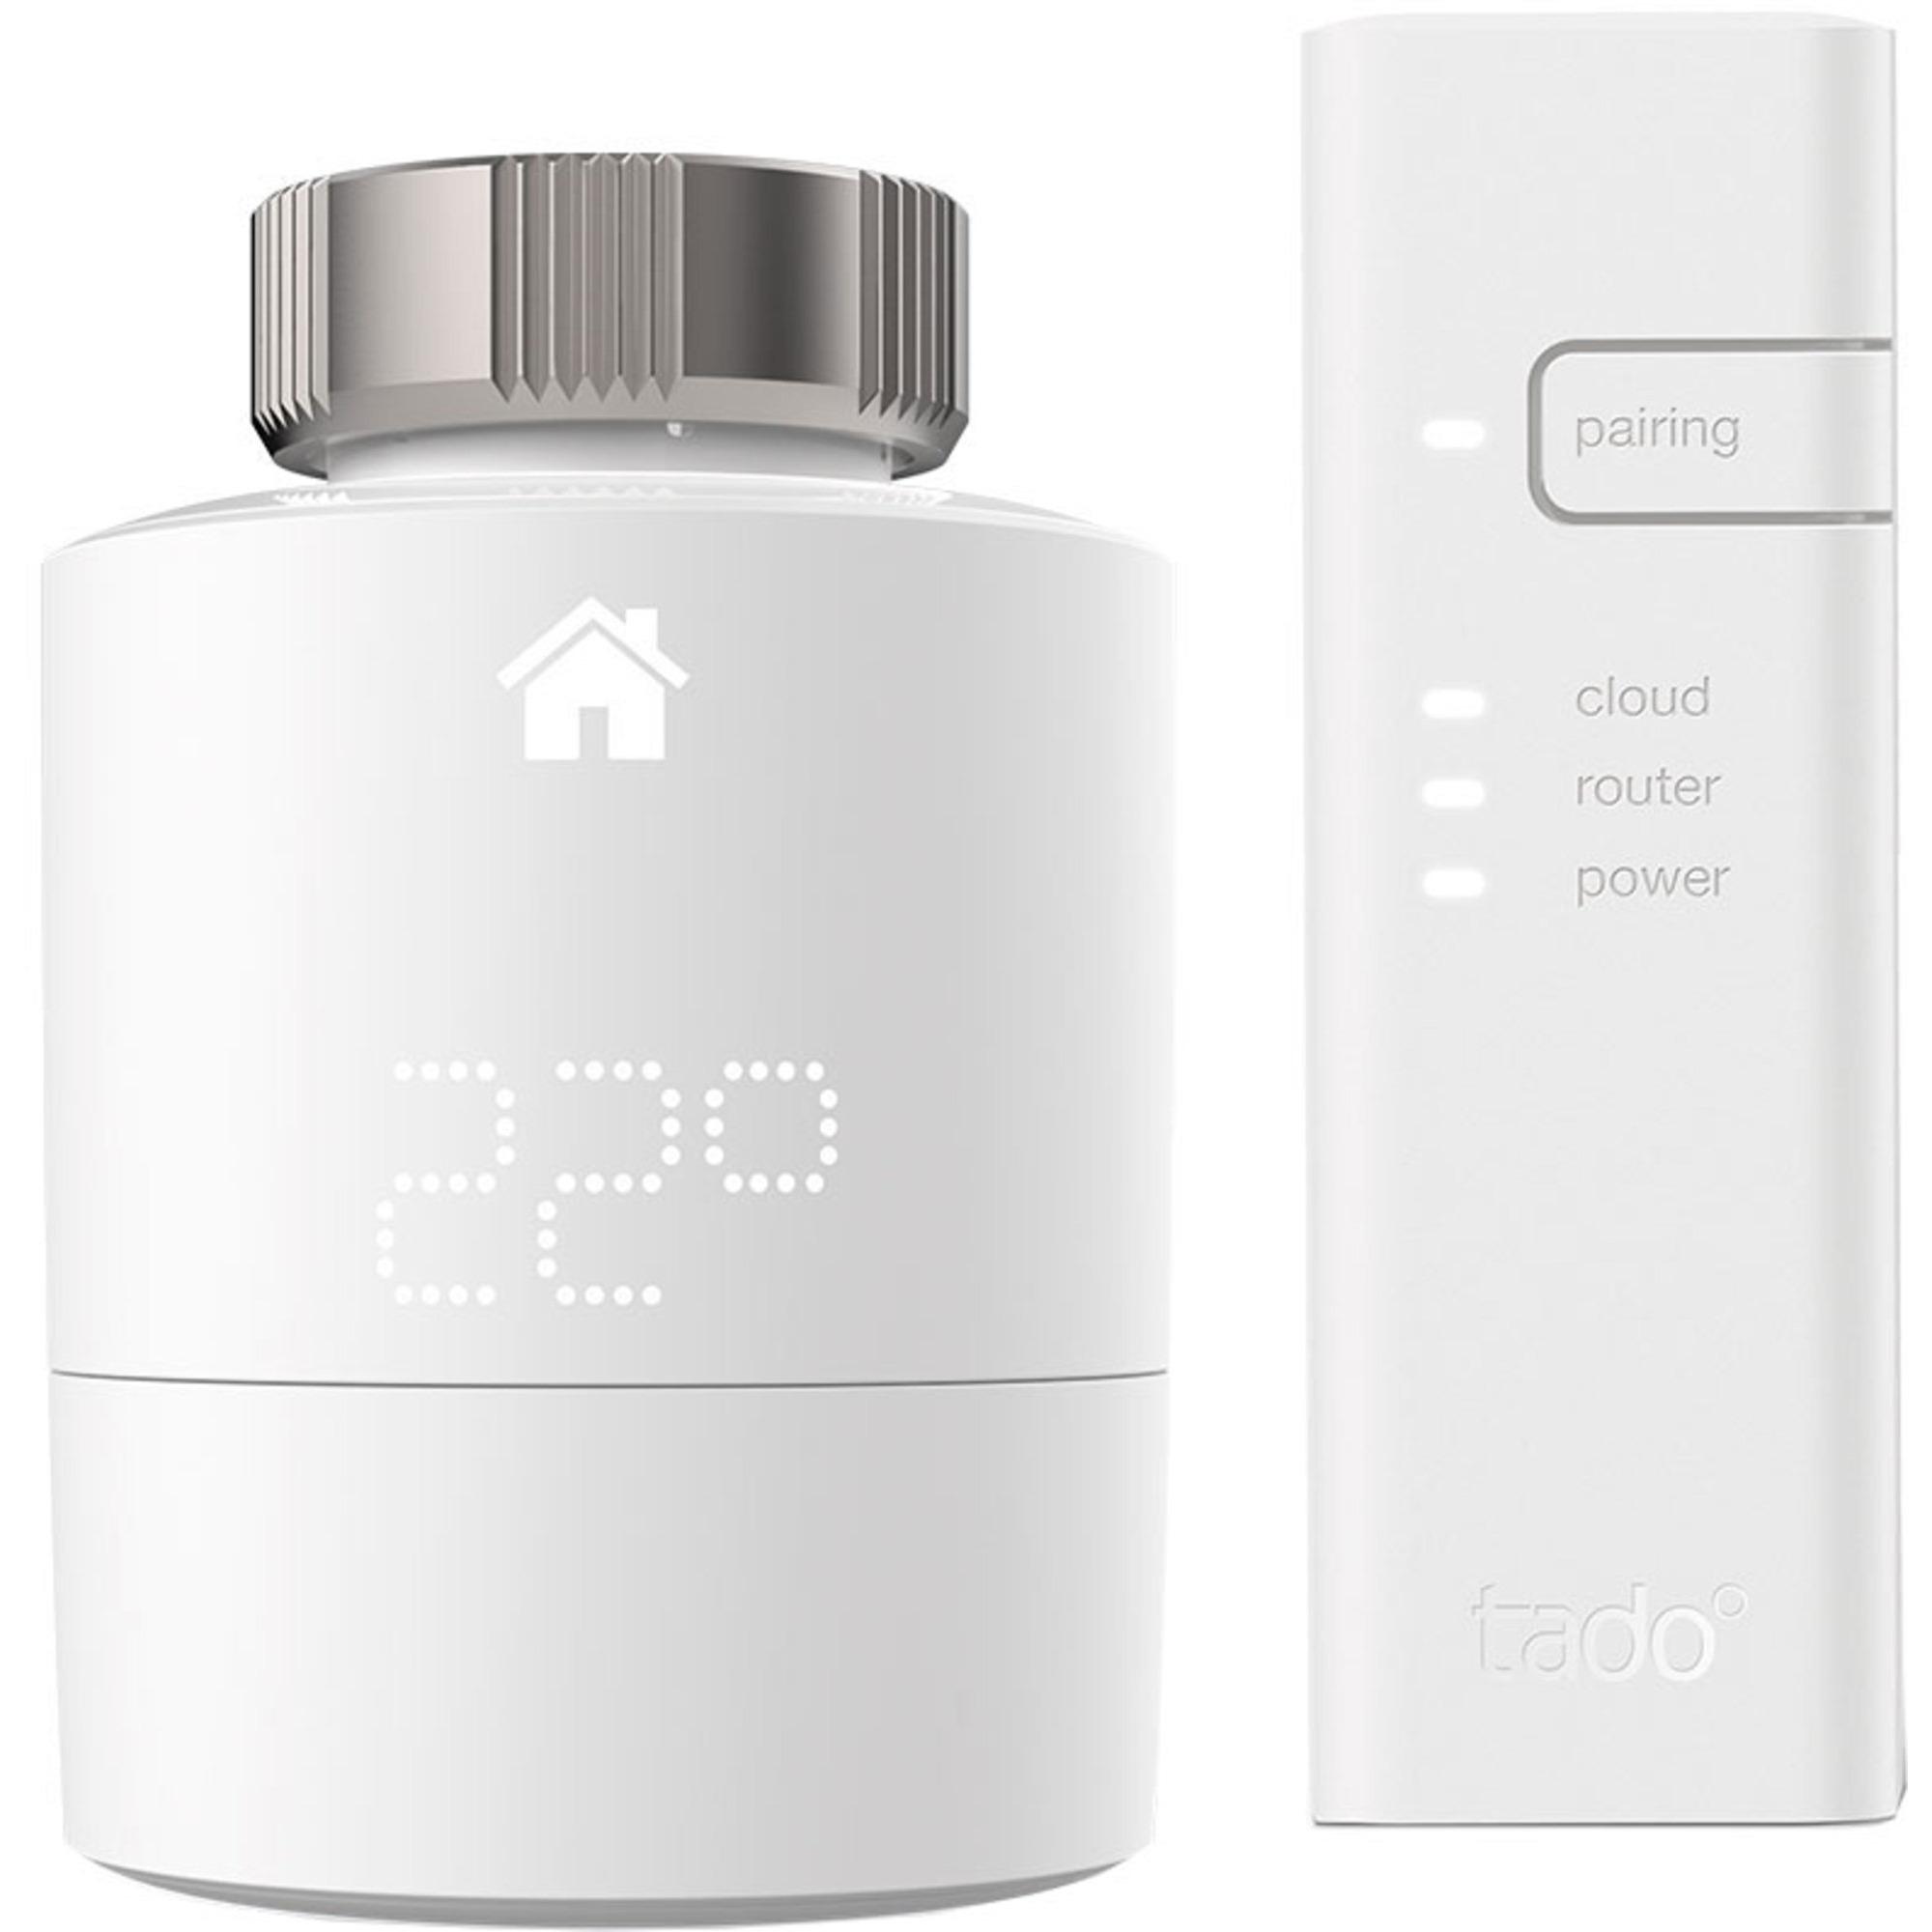 Tado° Smart Radiator Thermostat V3+